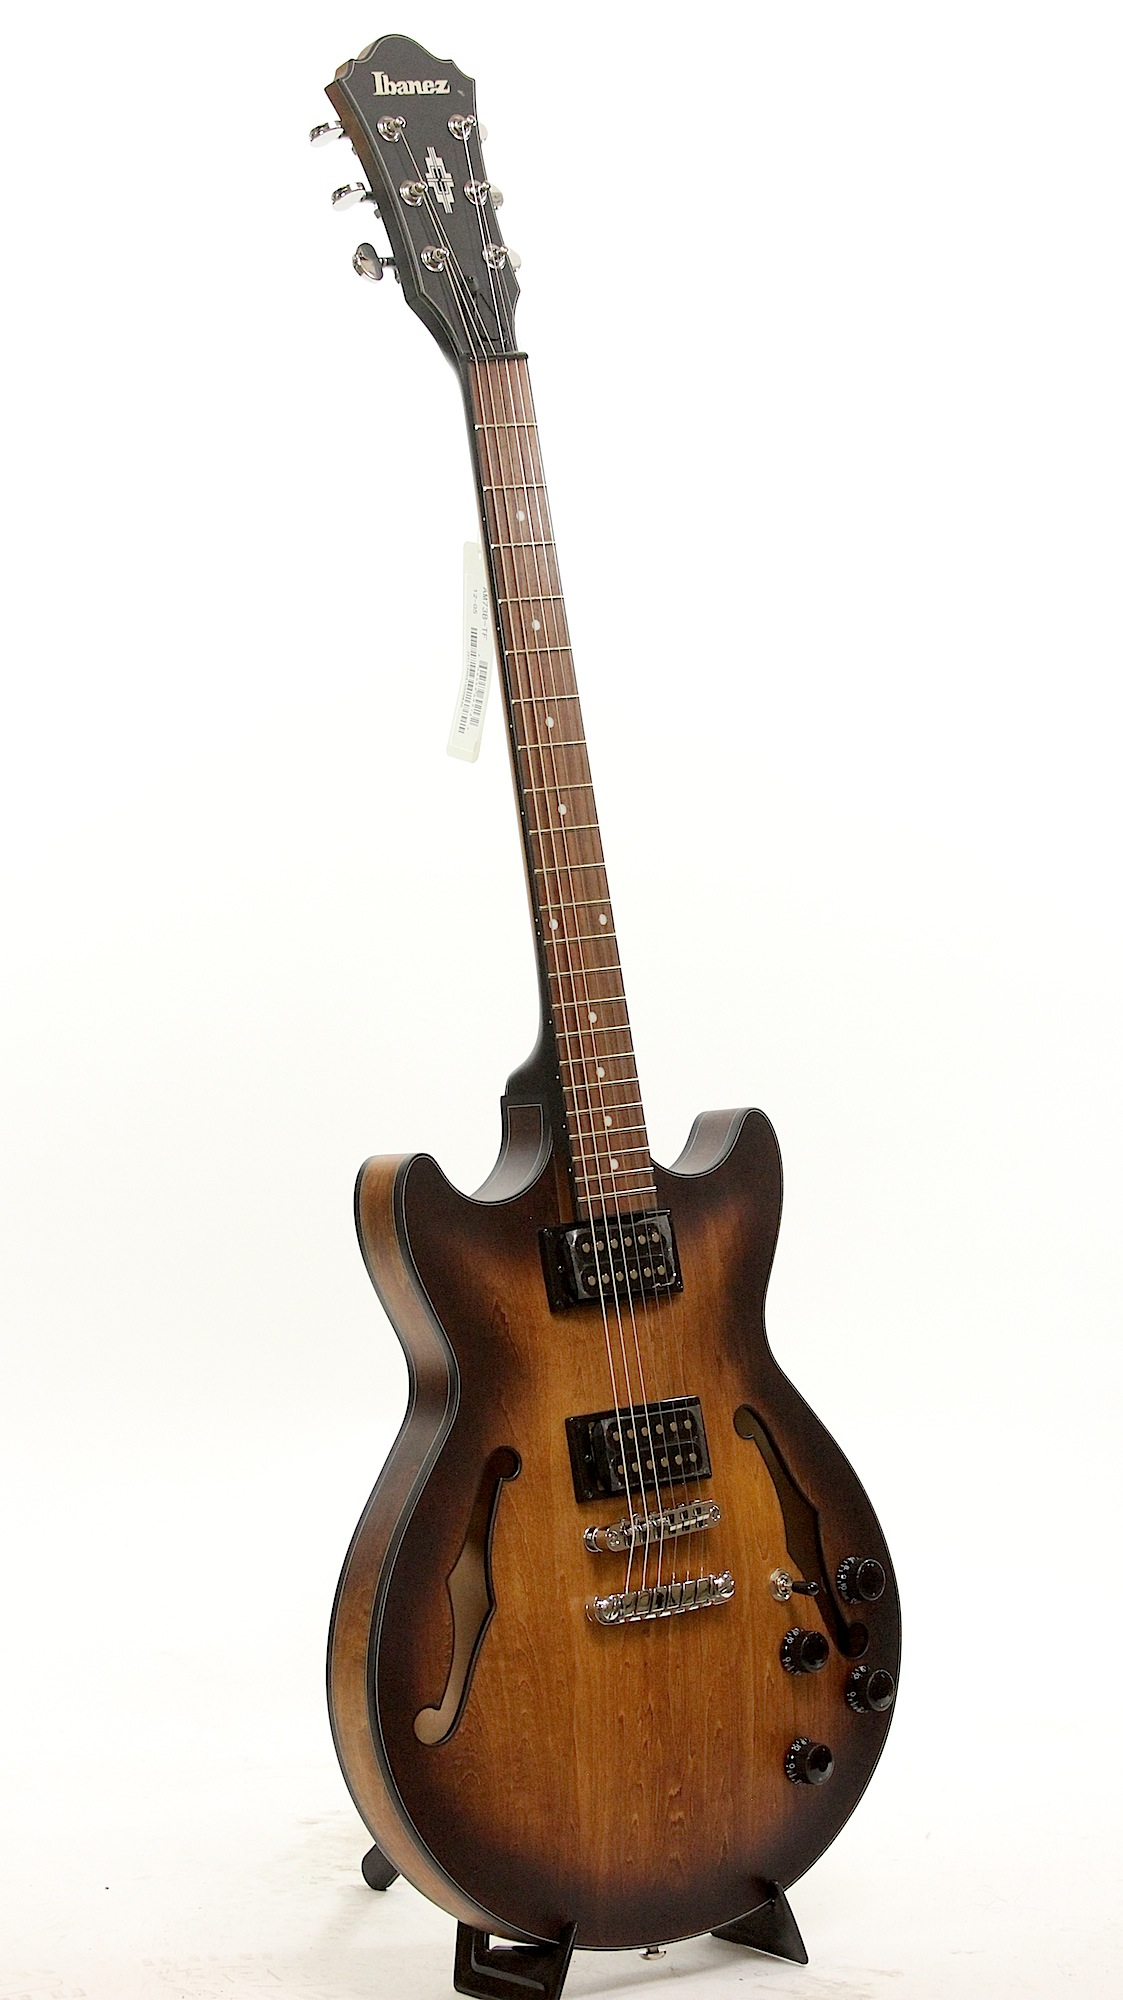 ibanez am73b tf tobacco flat semi hollow body electric guitar b stock 6. Black Bedroom Furniture Sets. Home Design Ideas